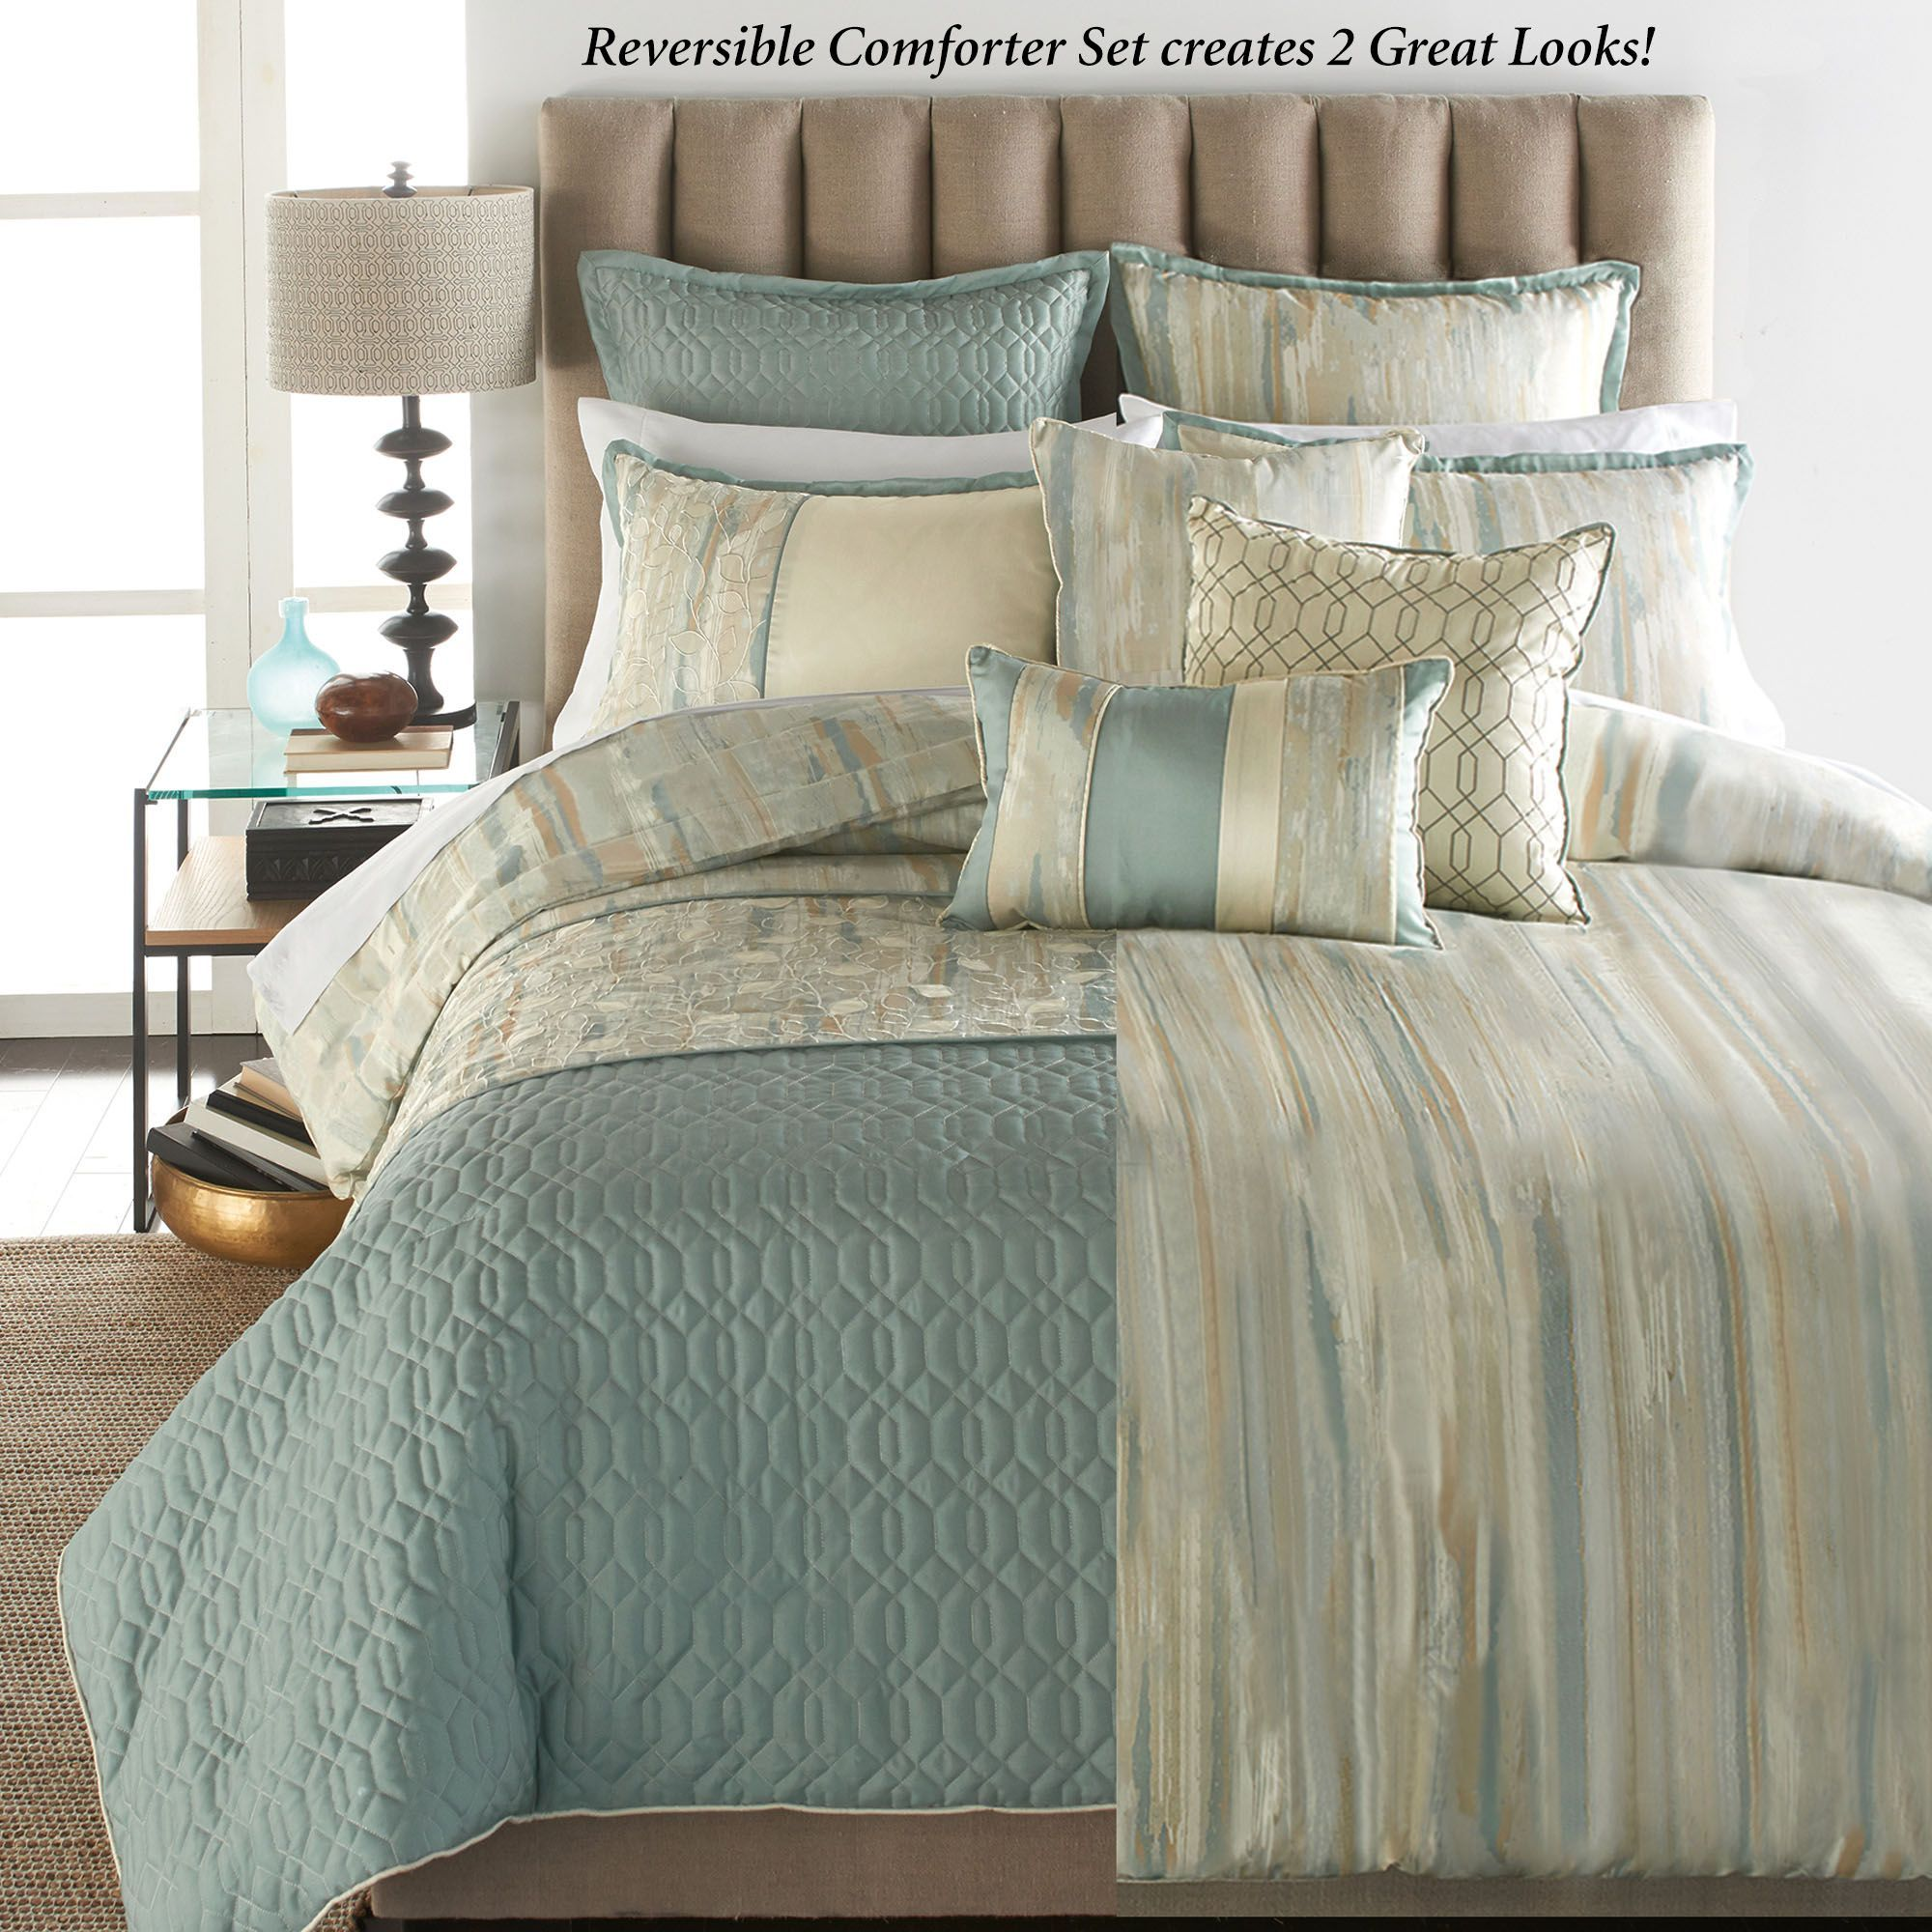 Sausalito Reversible Comforter 9 Pc Bed Set Comforter Sets